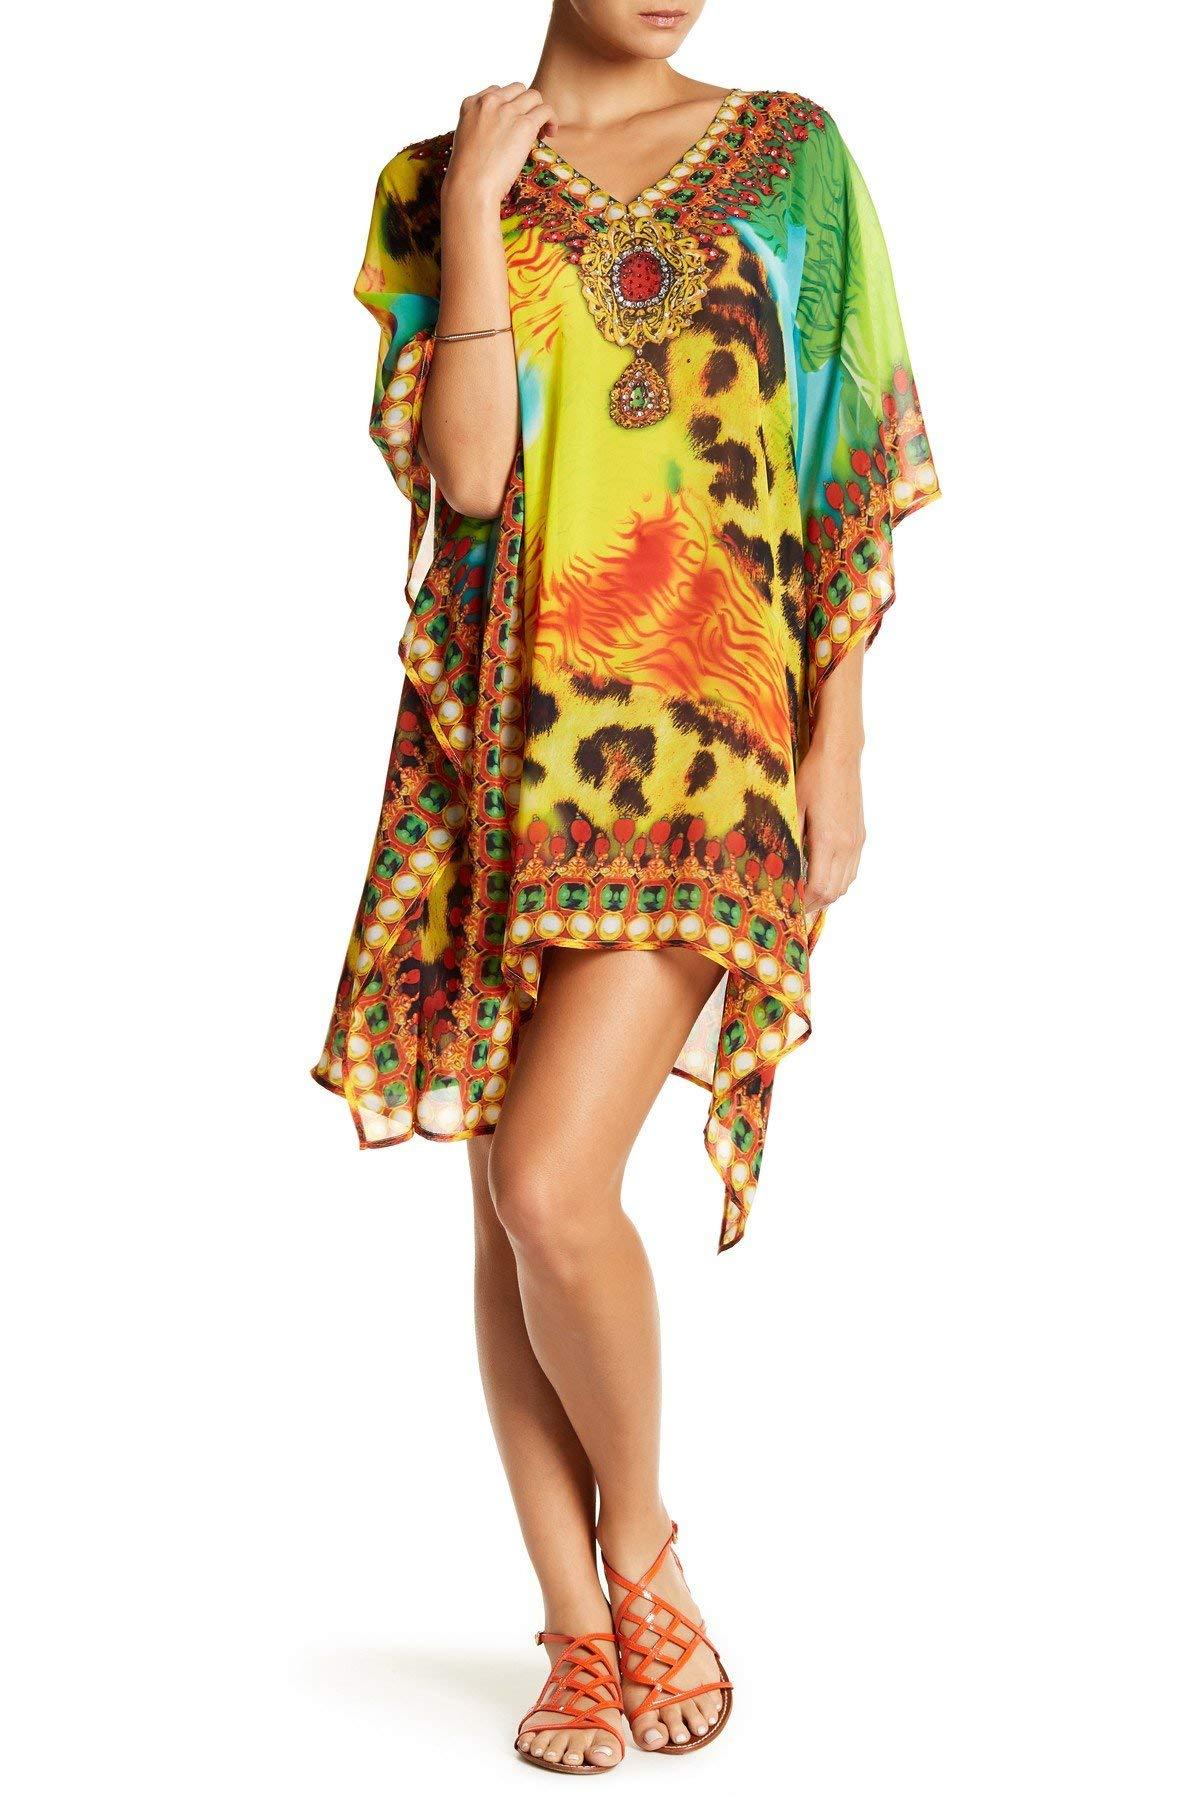 La moda Clothing designer caftan | By Goga SwimWear